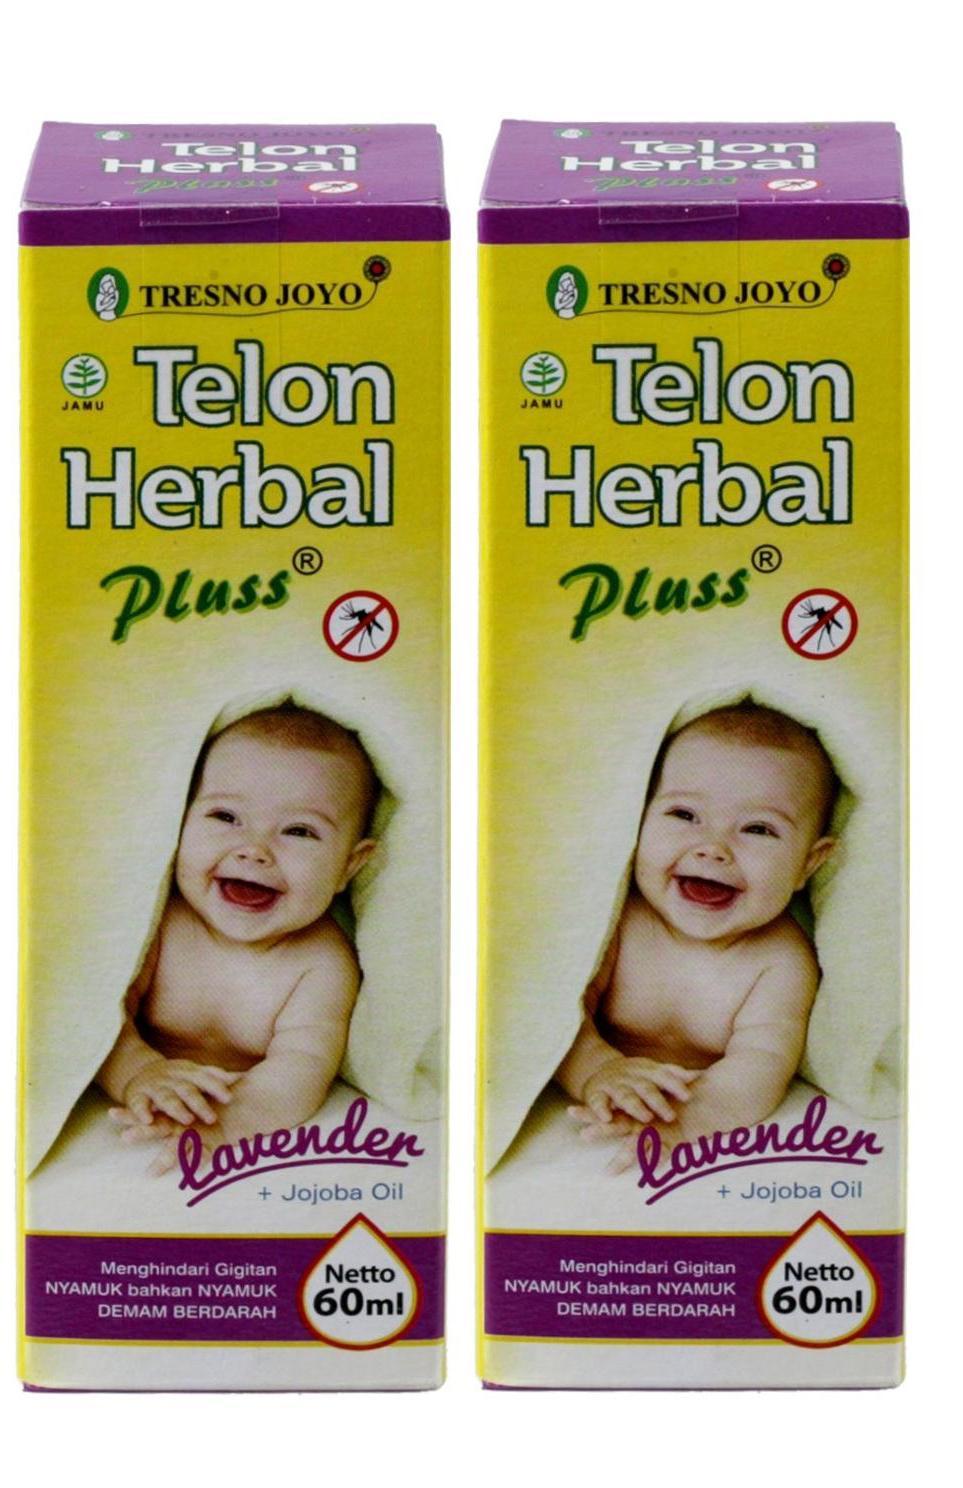 Buy Sell Cheapest Paket Minyak Telon Best Quality Product Deals Huki Promo Tresno Joyo Herbal Pluss Jojoba Oil Lavender Anti Nyamuk 60ml